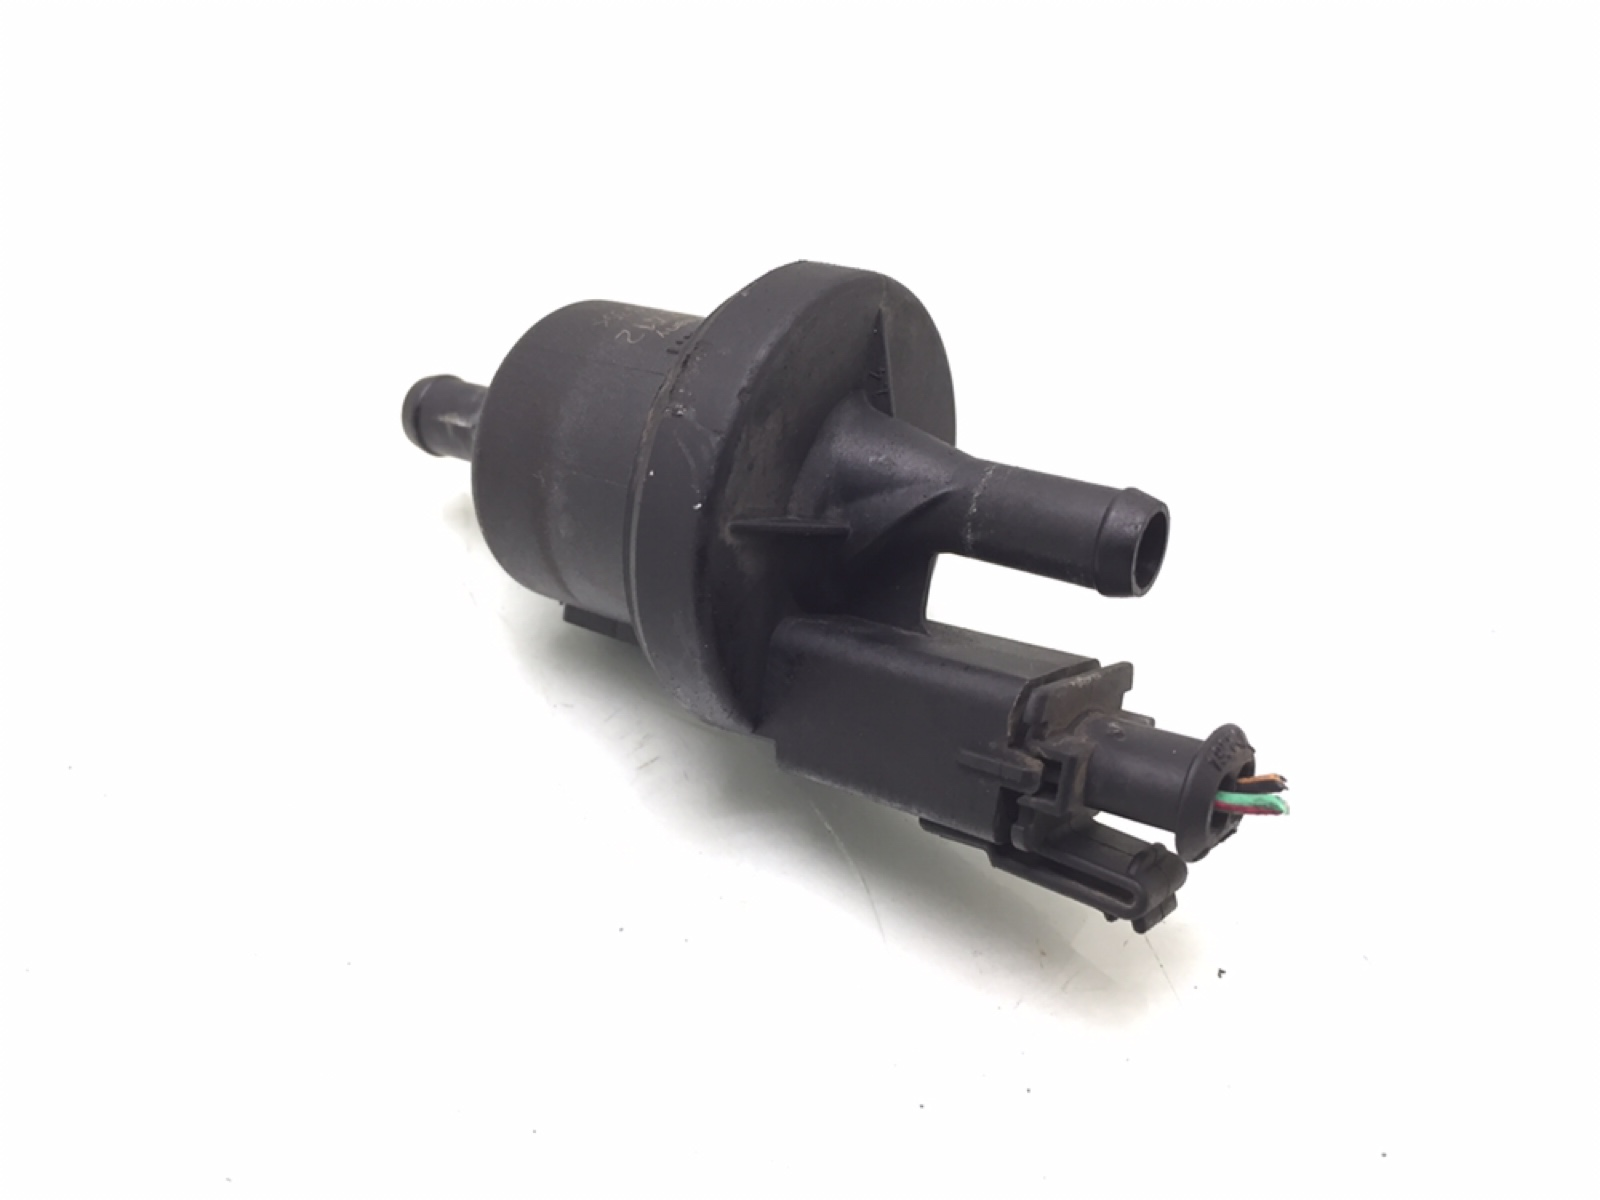 Клапан вентиляции топливного бака Ford C-Max 1.6 I 2005 (б/у)